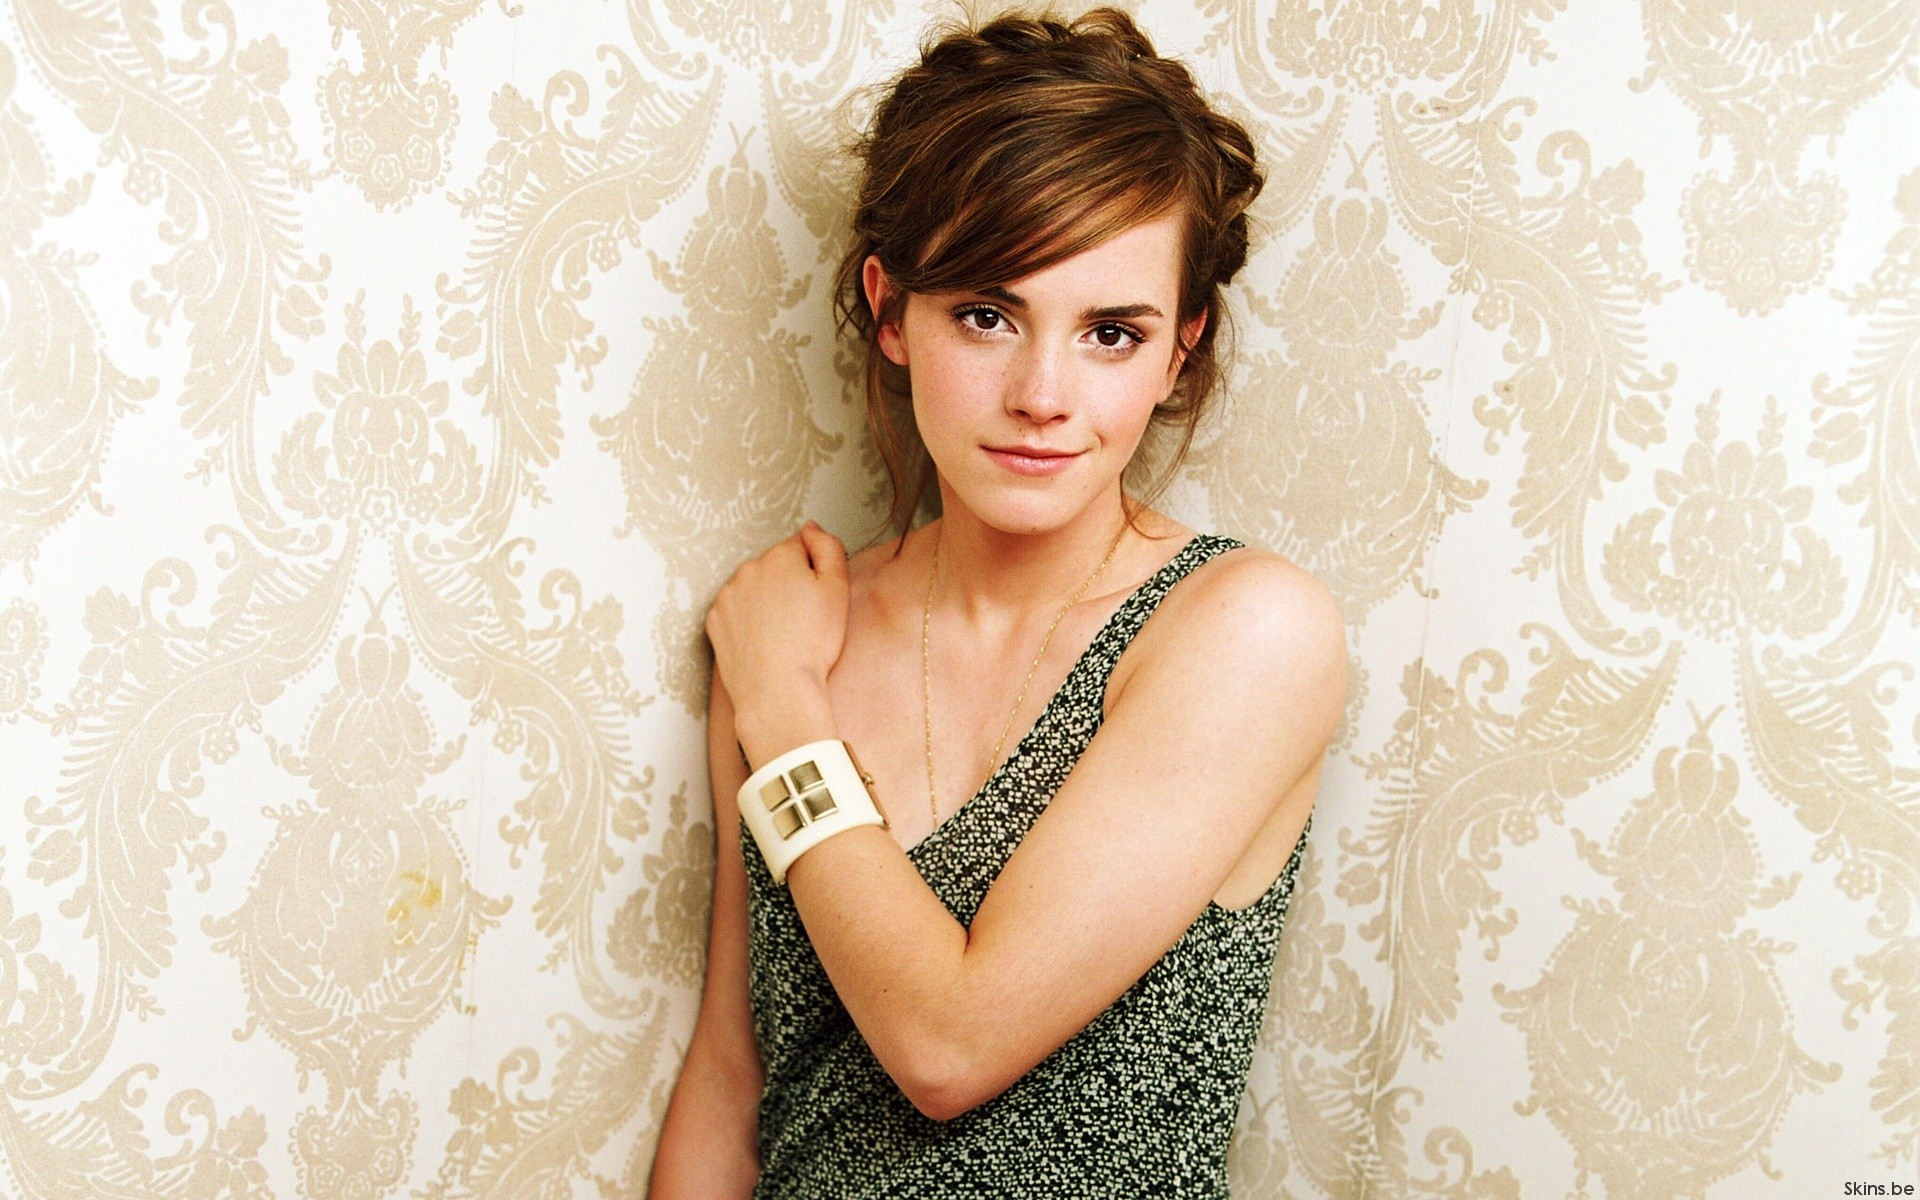 Emma Watson Wallpapers 2018 (65+ Images